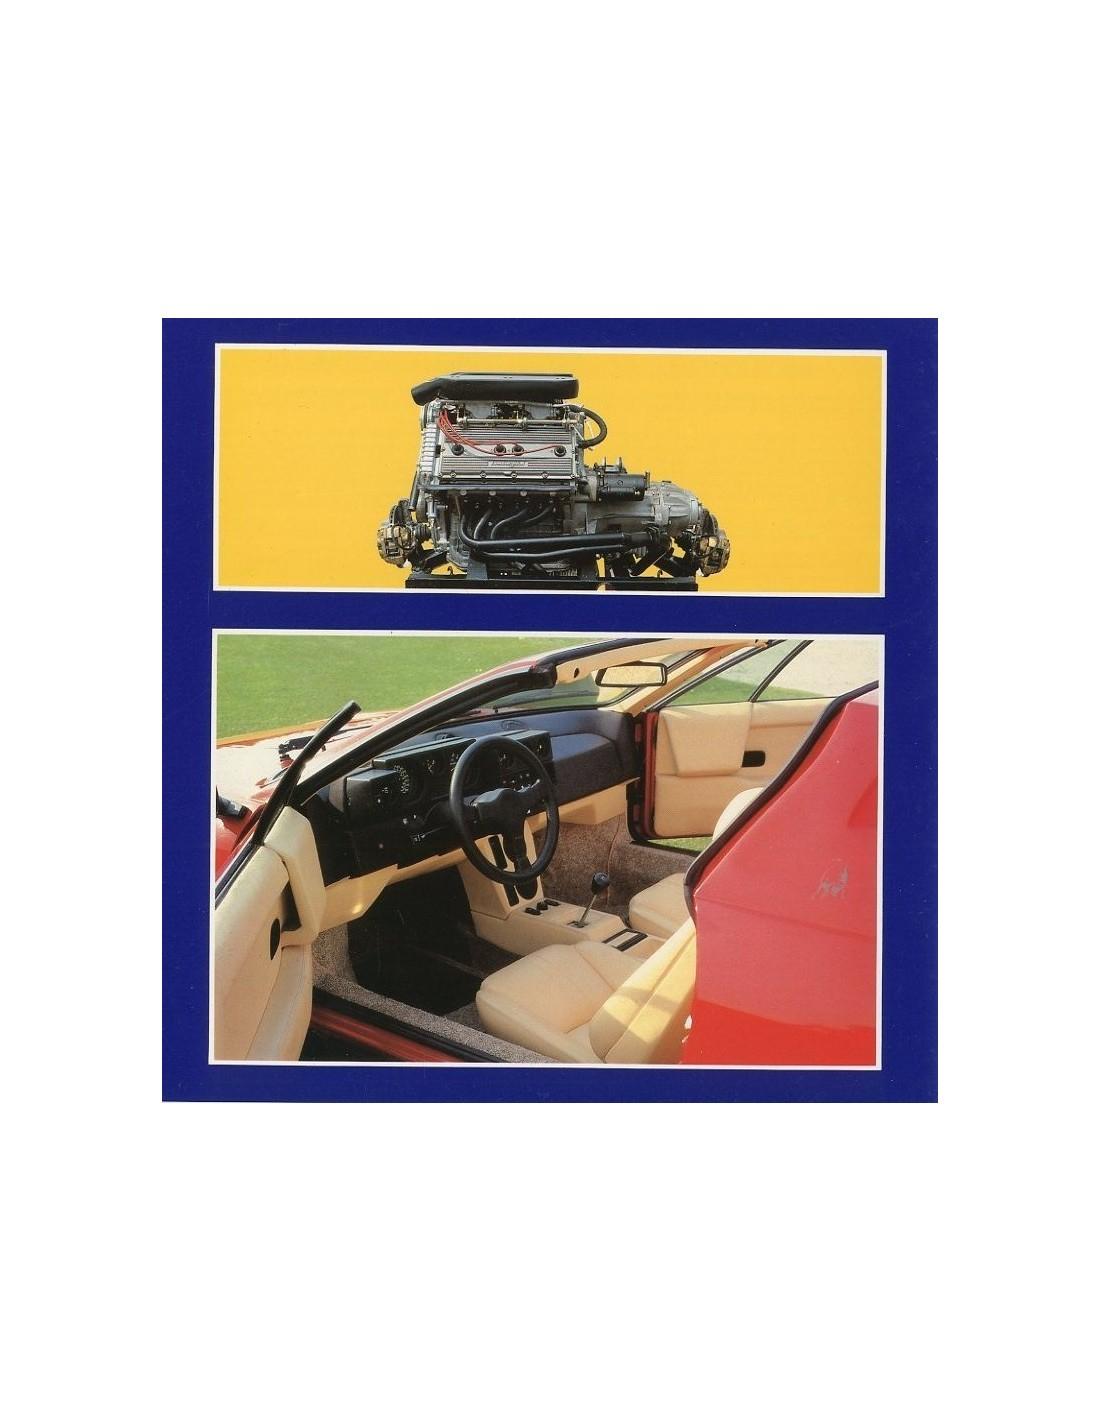 https://www.autolit.eu/5505-thickbox_default/1981-lamborghini-jalpa-3500-brochure.jpg